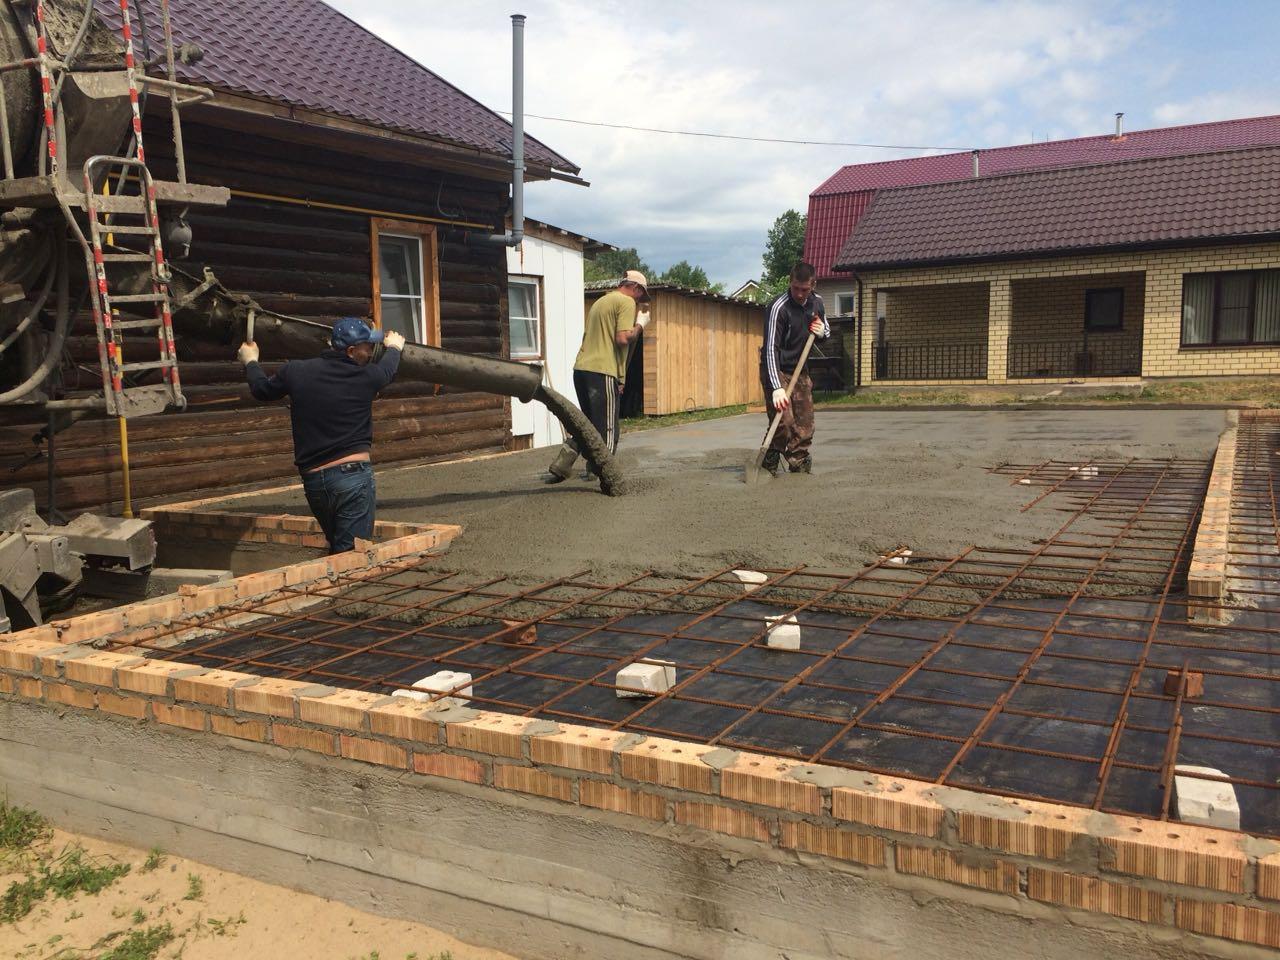 Заливка бетоном монолитной плиты фундамента дома